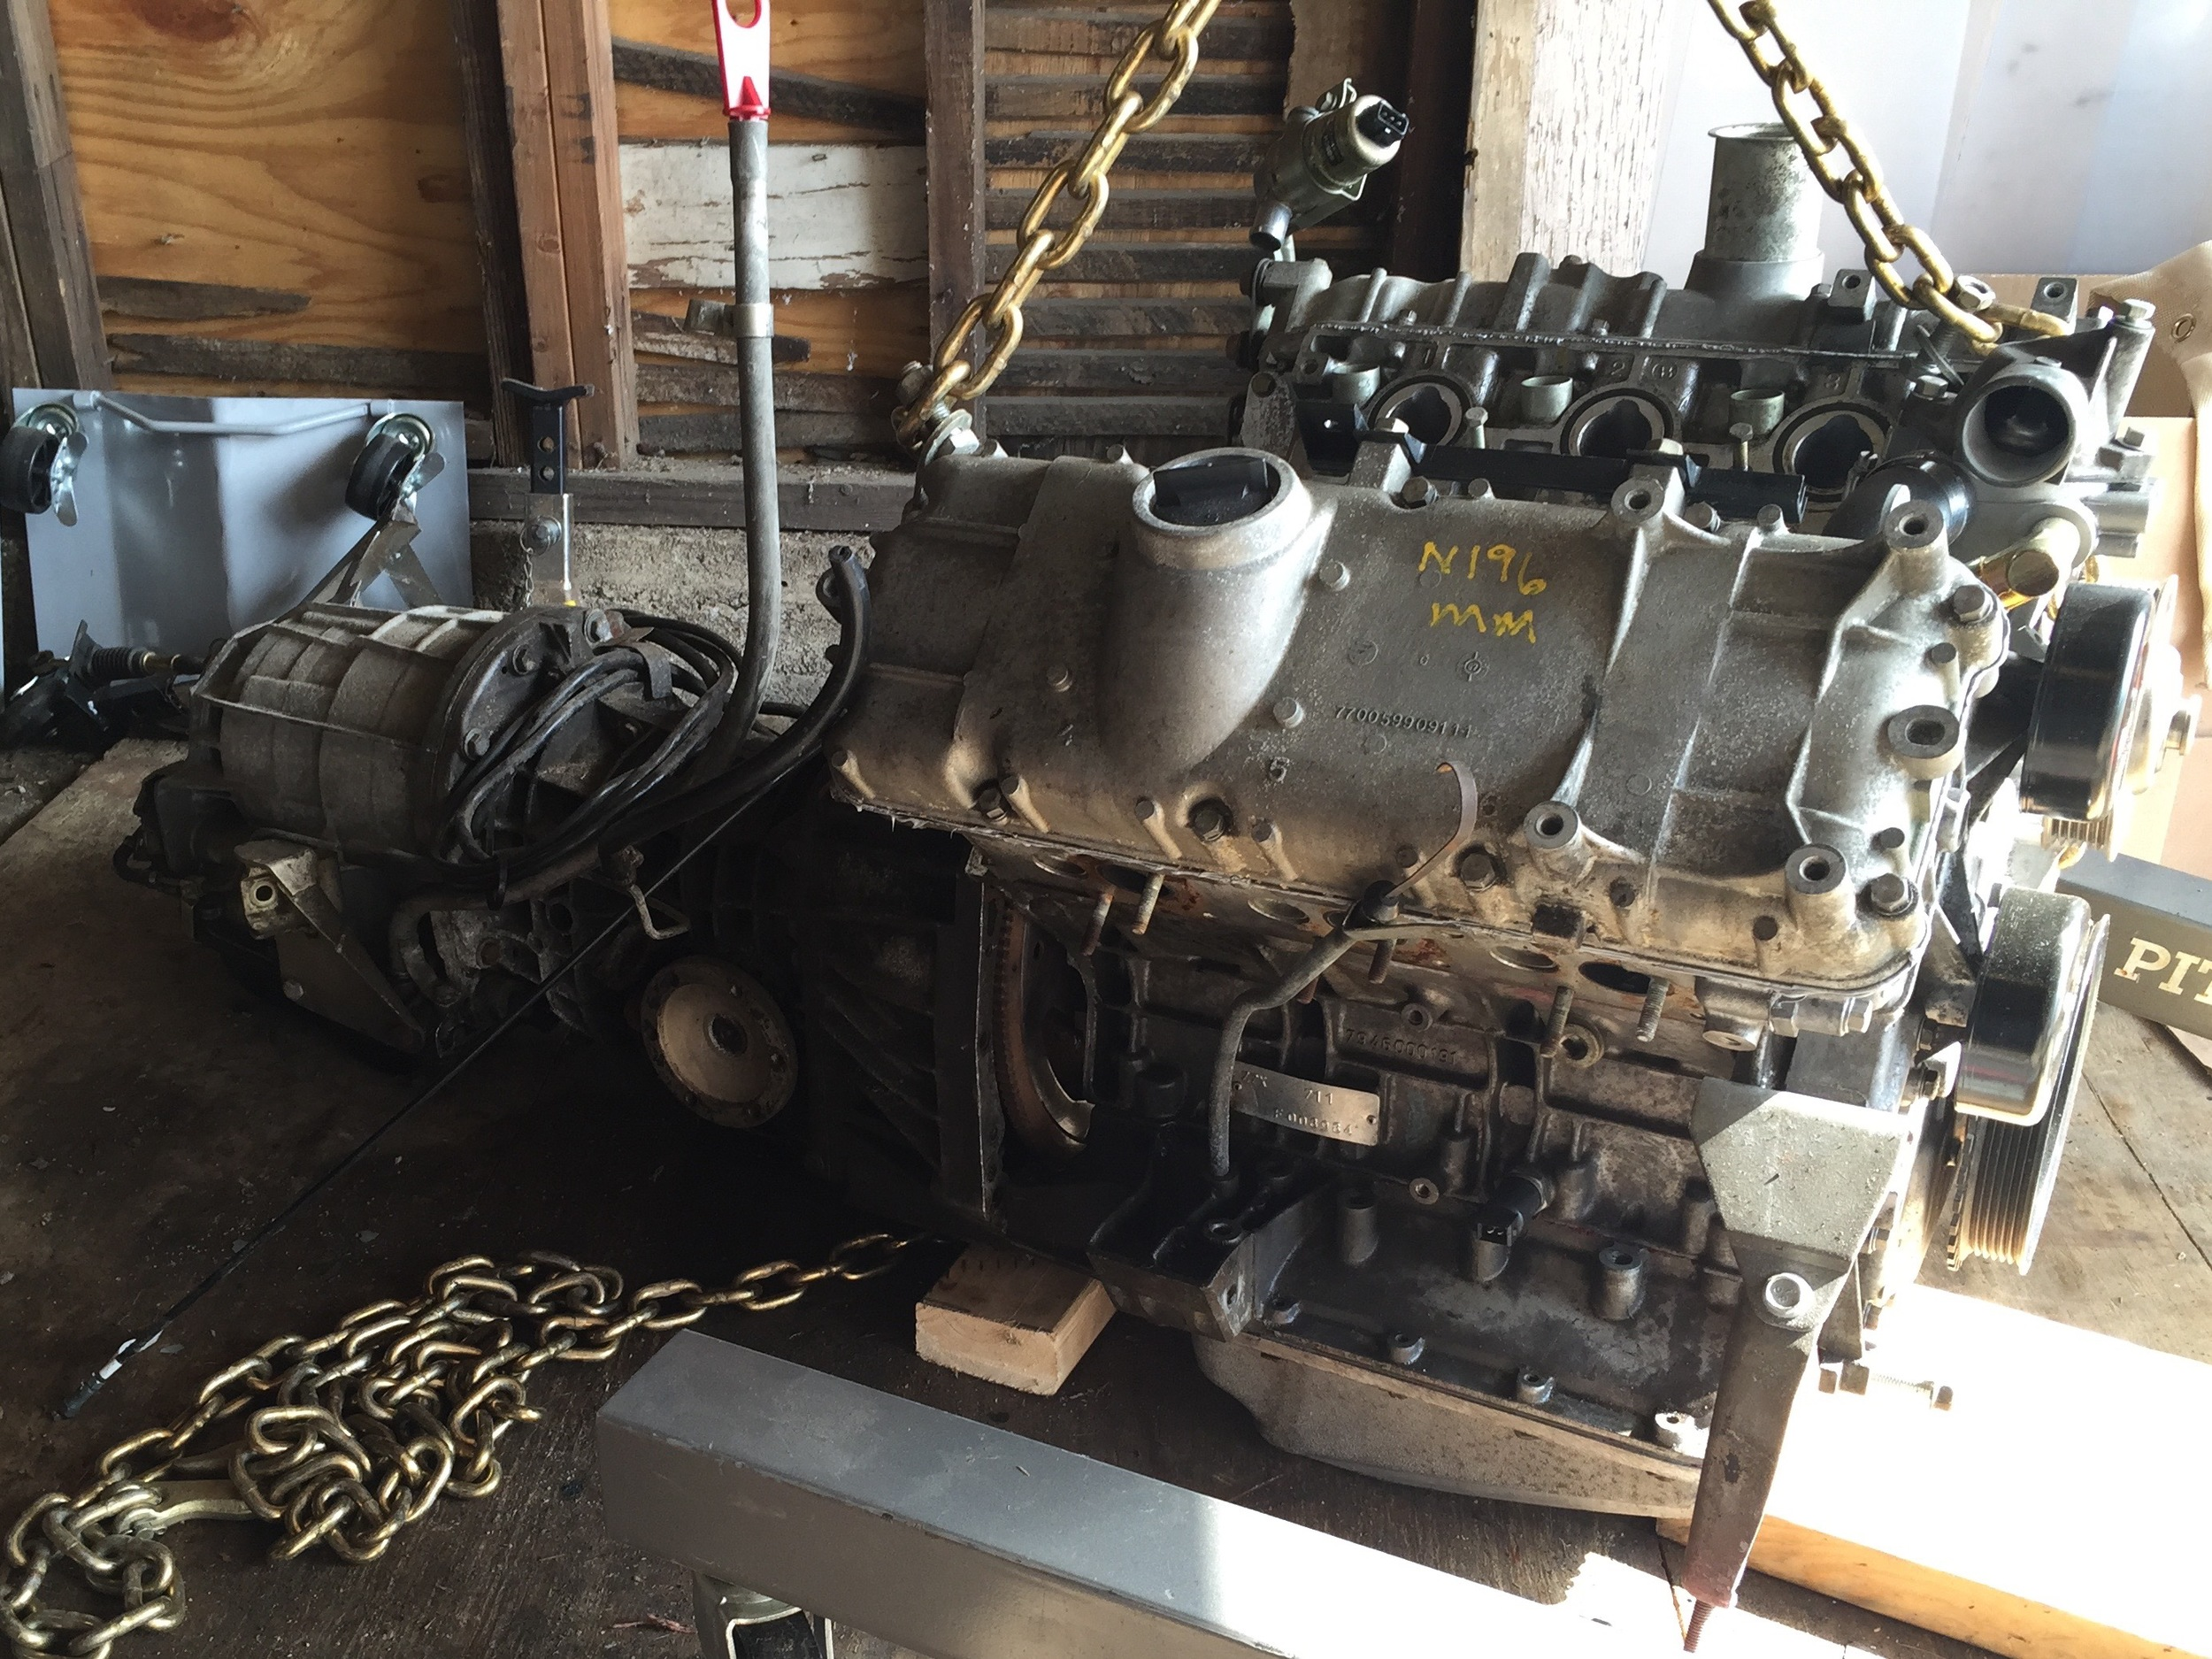 Engine and transmission bolted together.